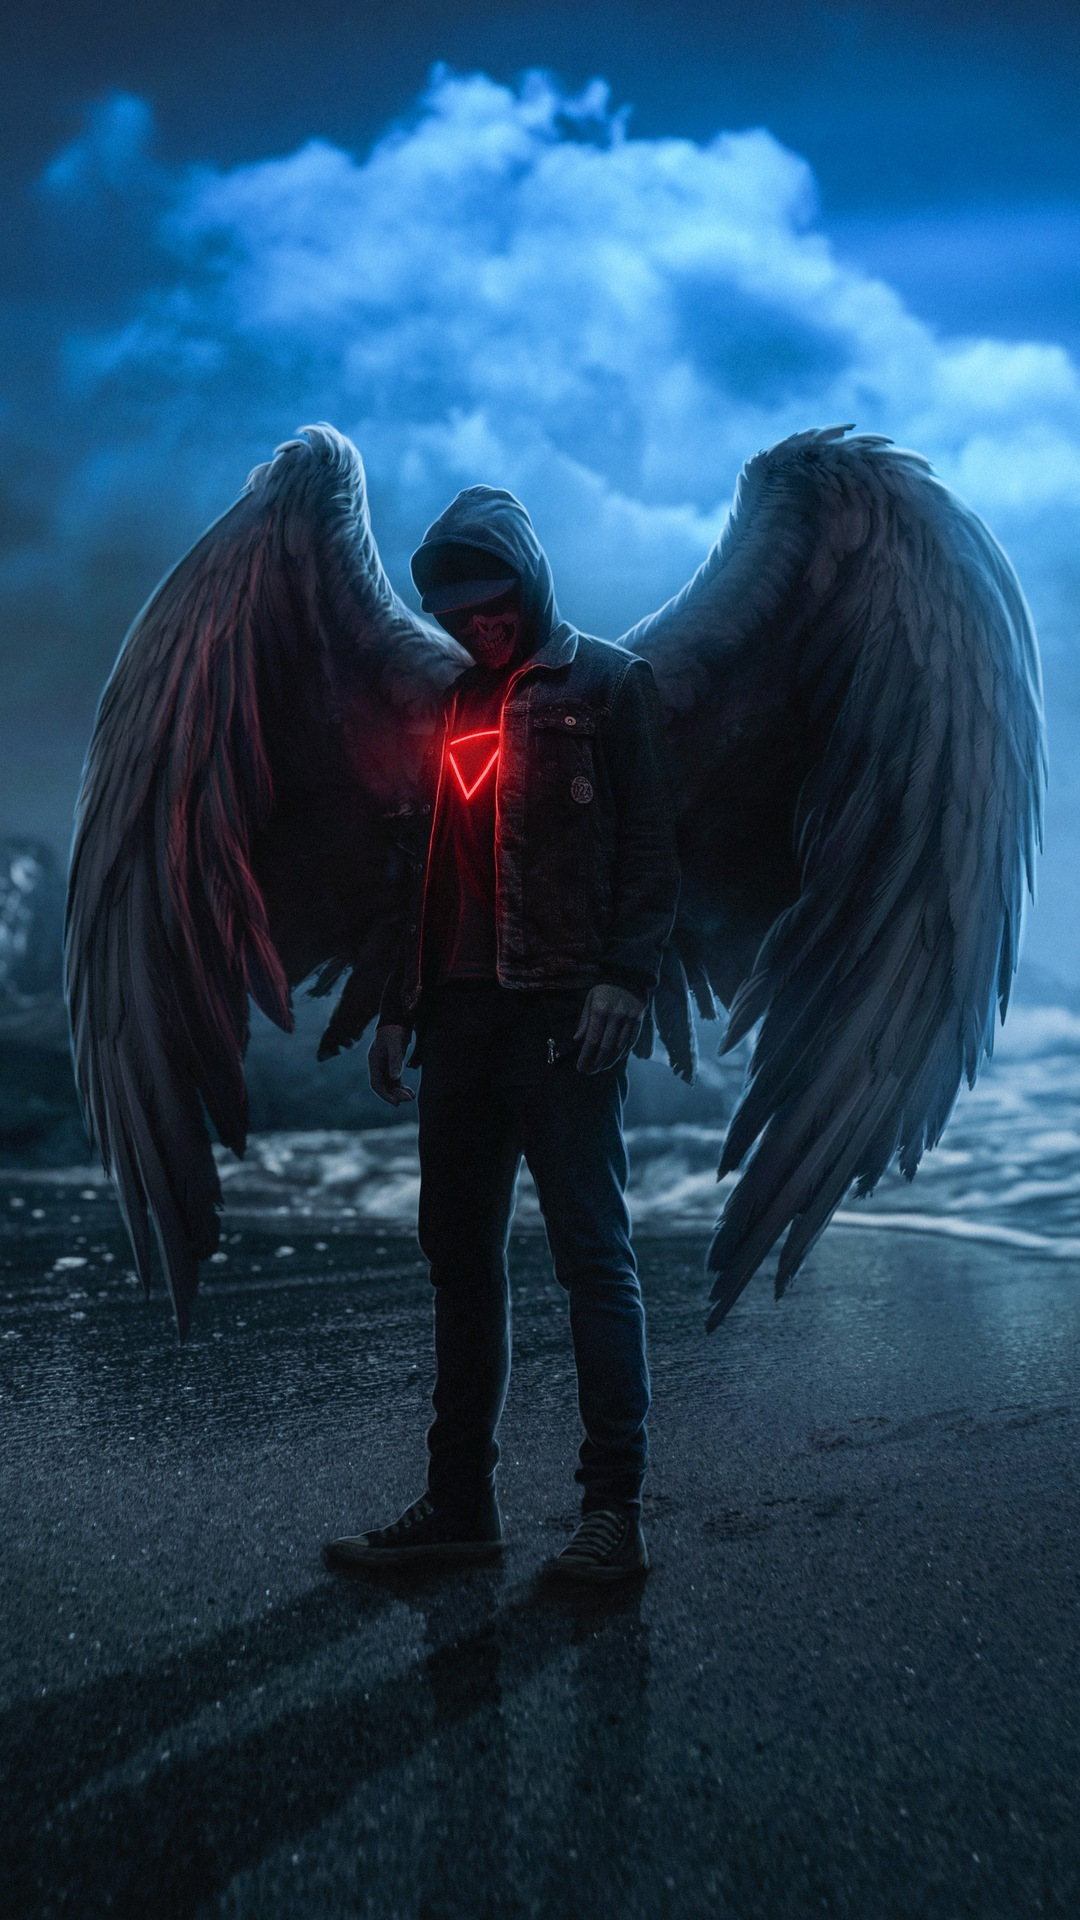 skull-man-with-wings-4k-04.jpg